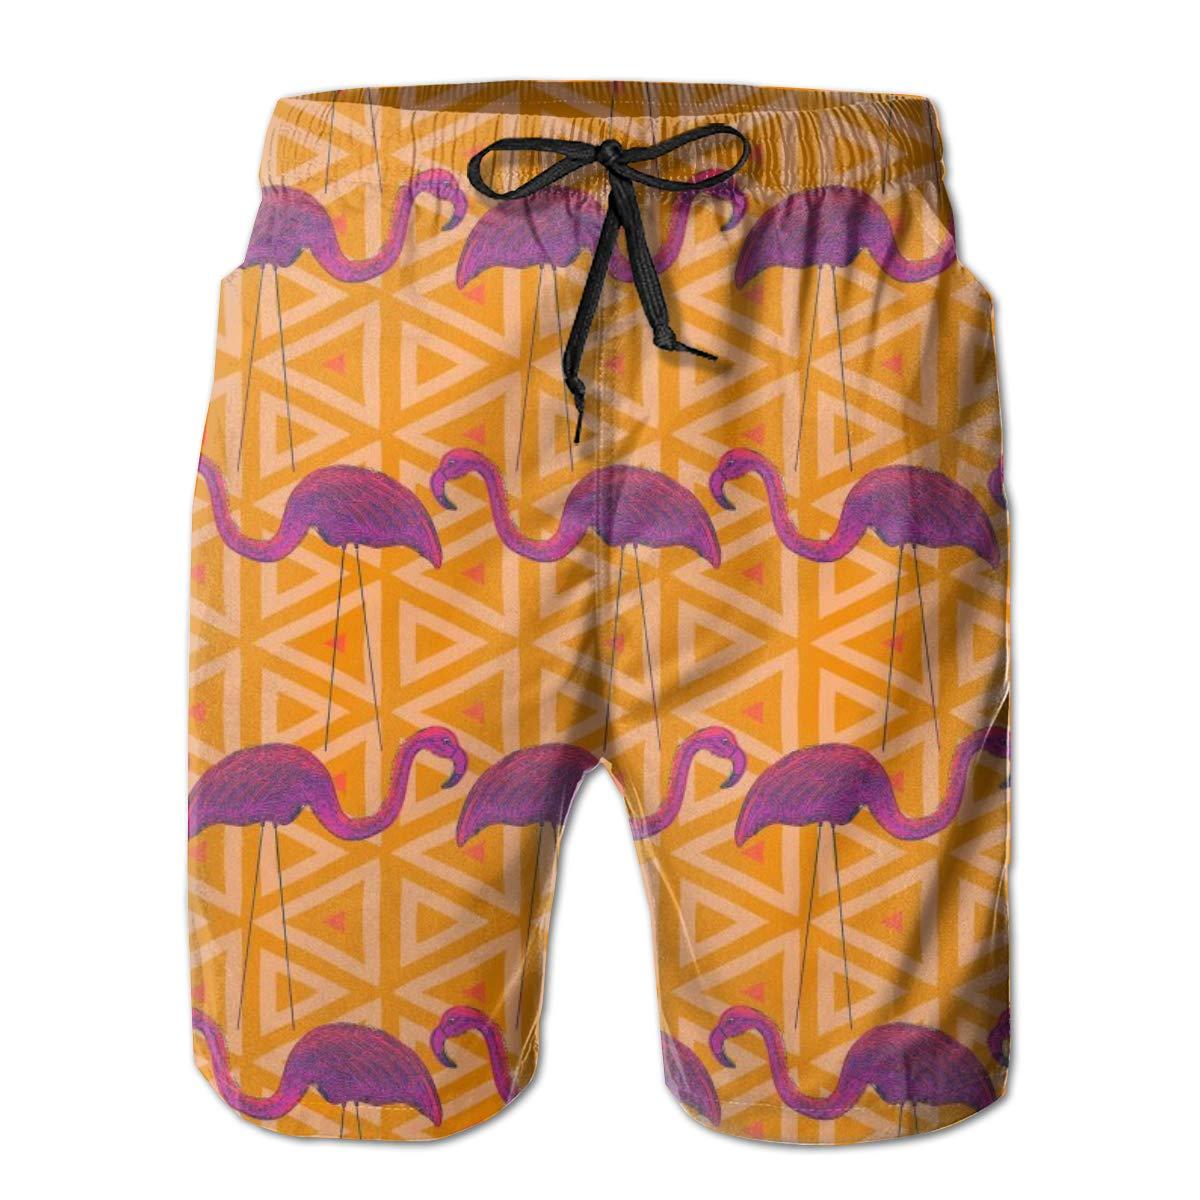 Mens Swim Trunks Orange Flamingos Quick Dry Beach Board Shorts with Mesh Lining